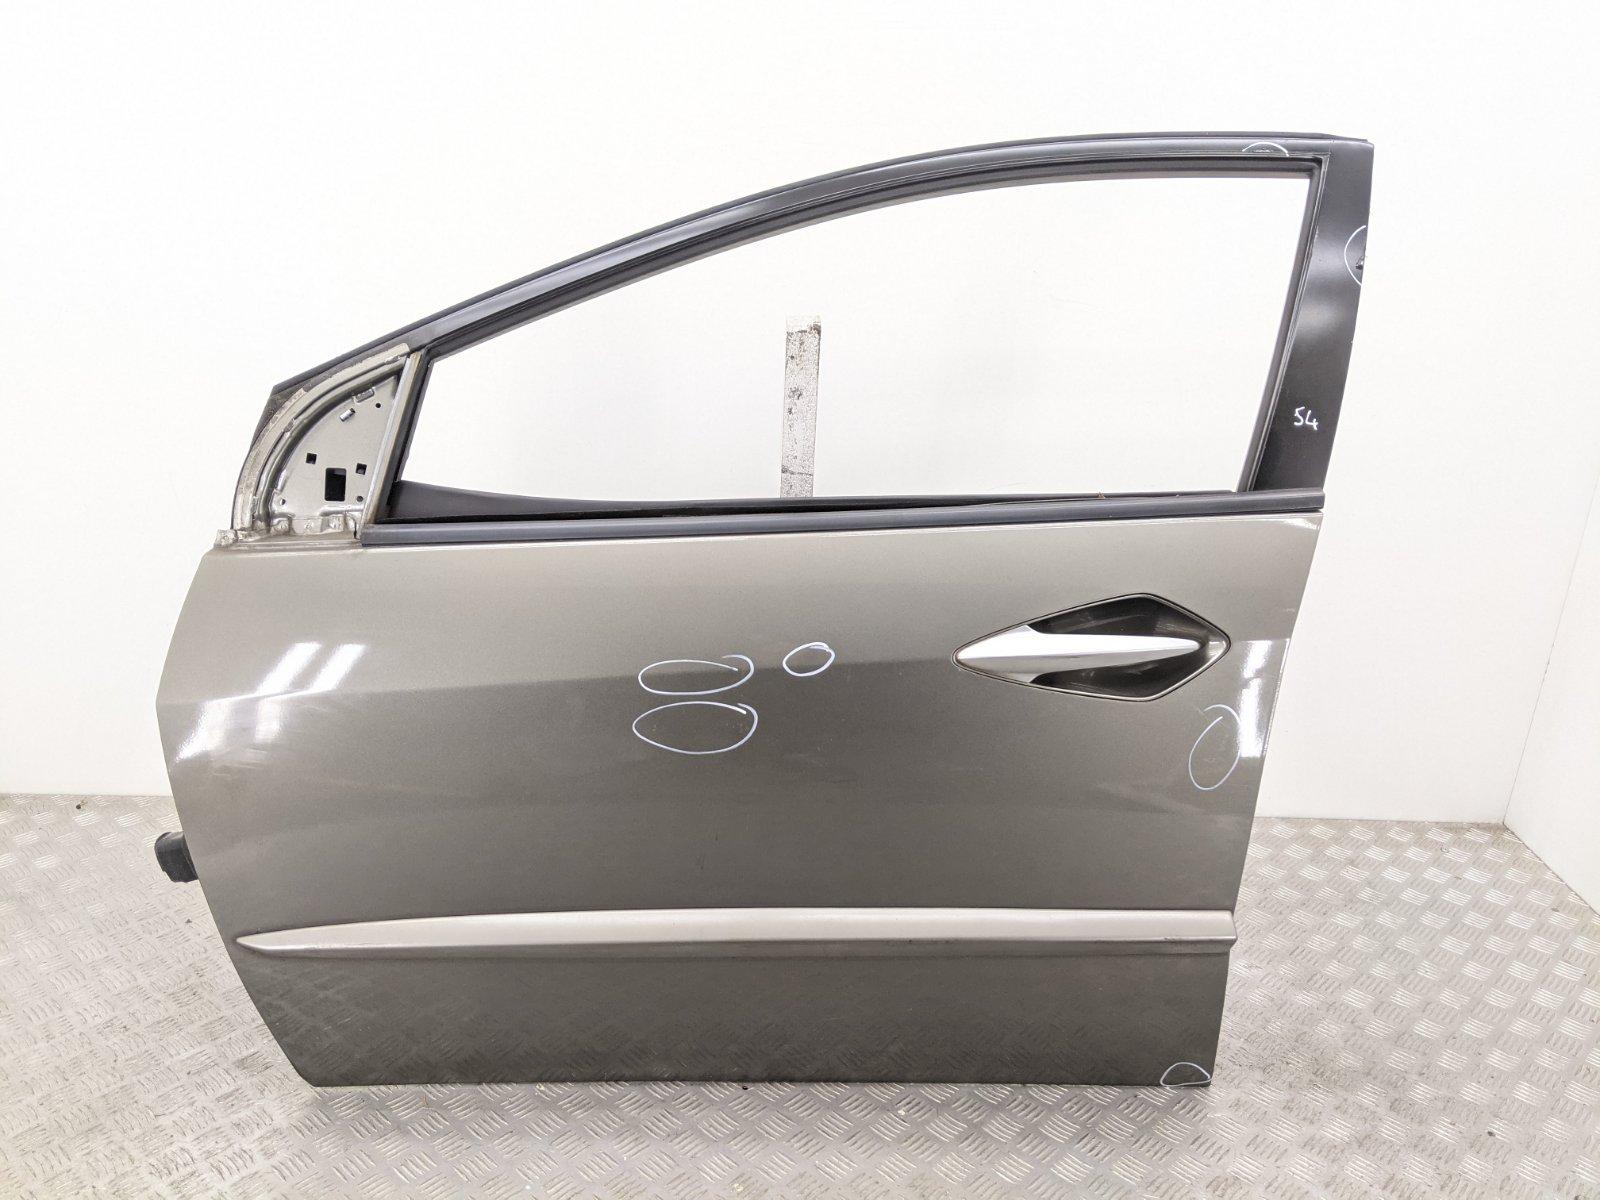 Дверь передняя левая Honda Civic 1.8 I 2006 (б/у)